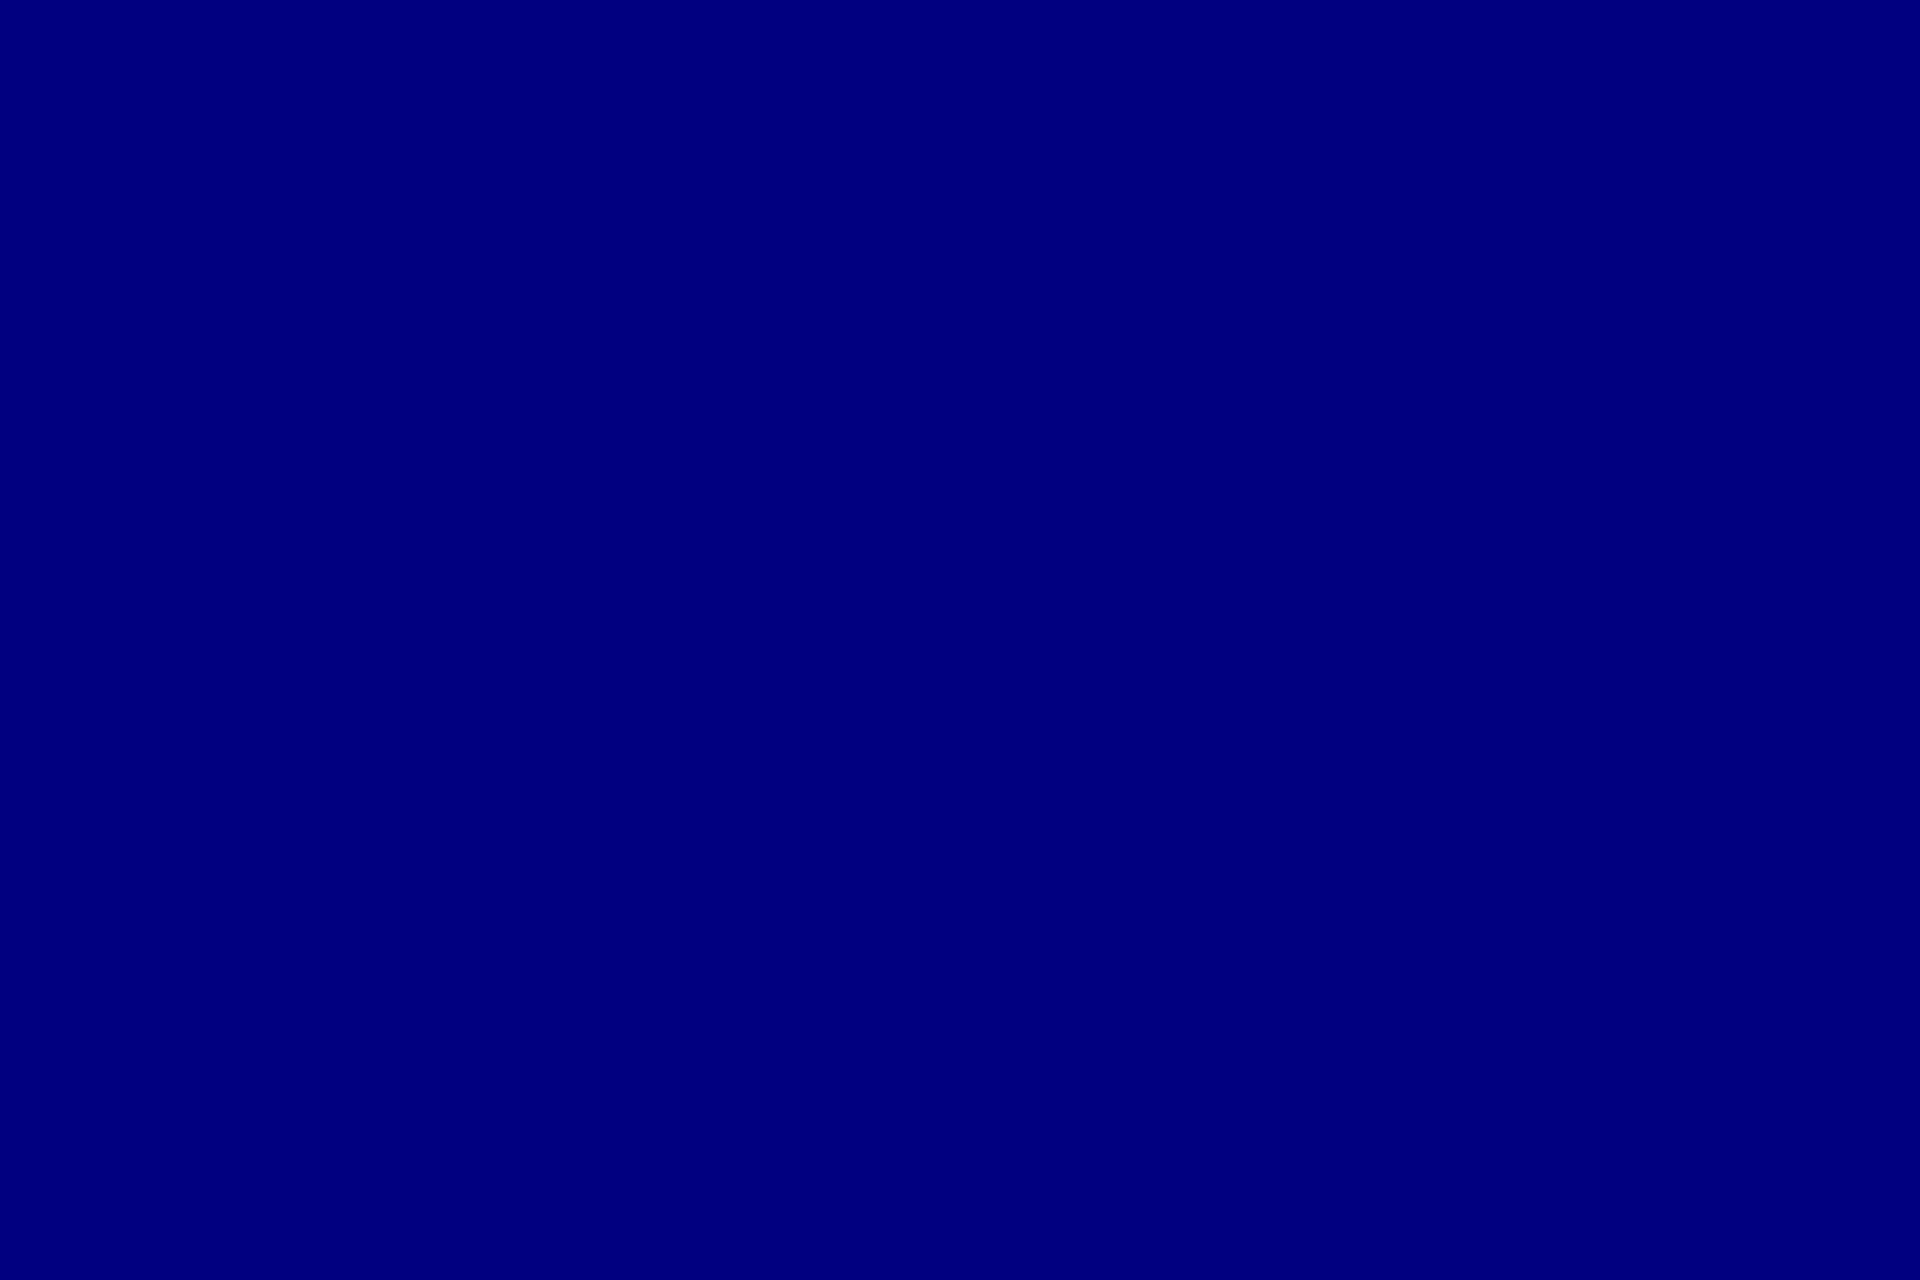 navy fabric